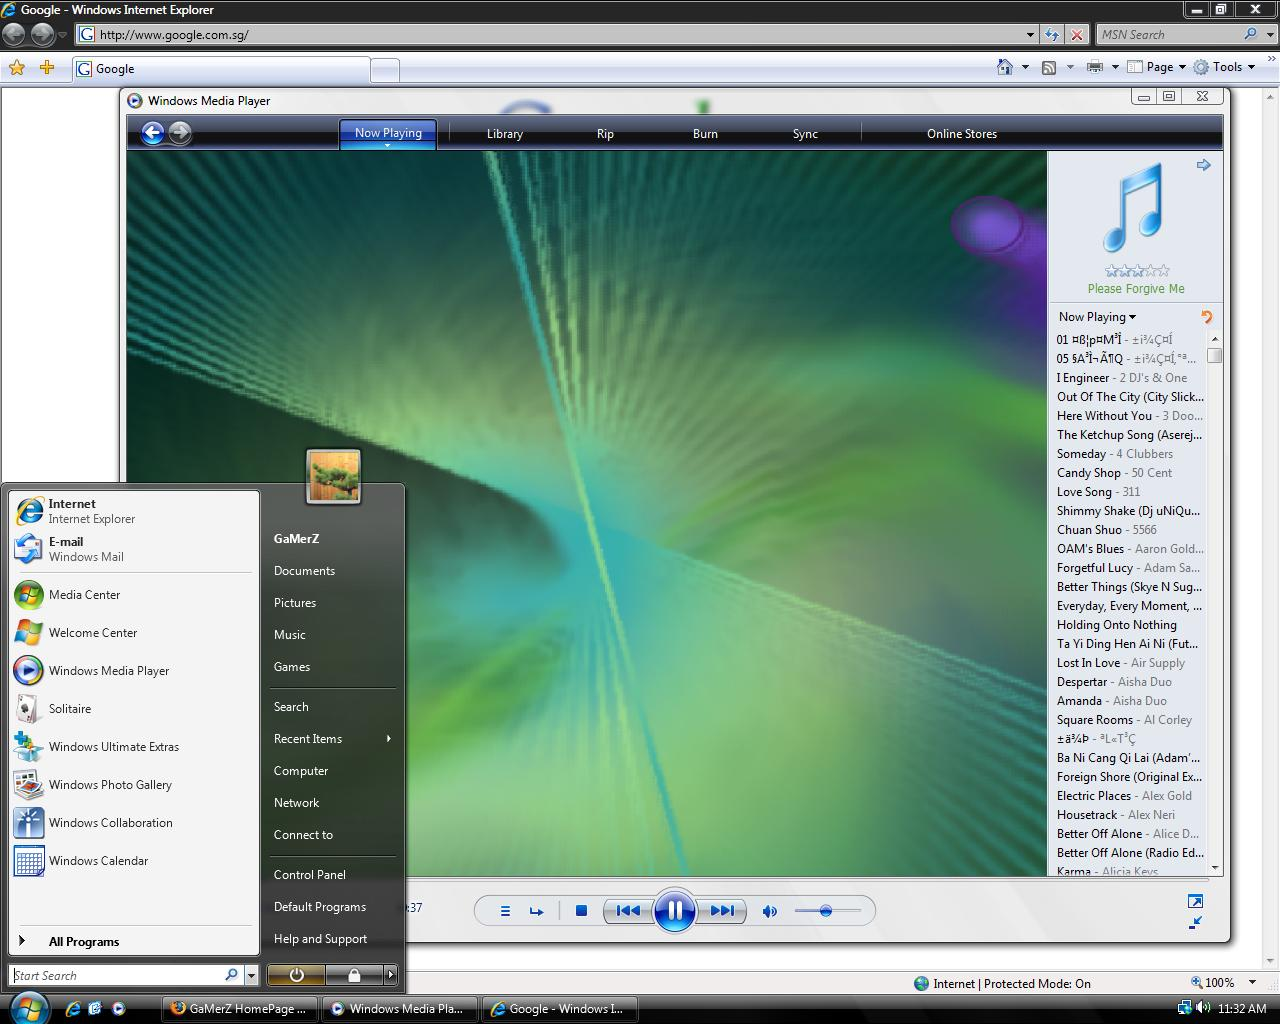 Viewing Image - gamerz_vista.jpg